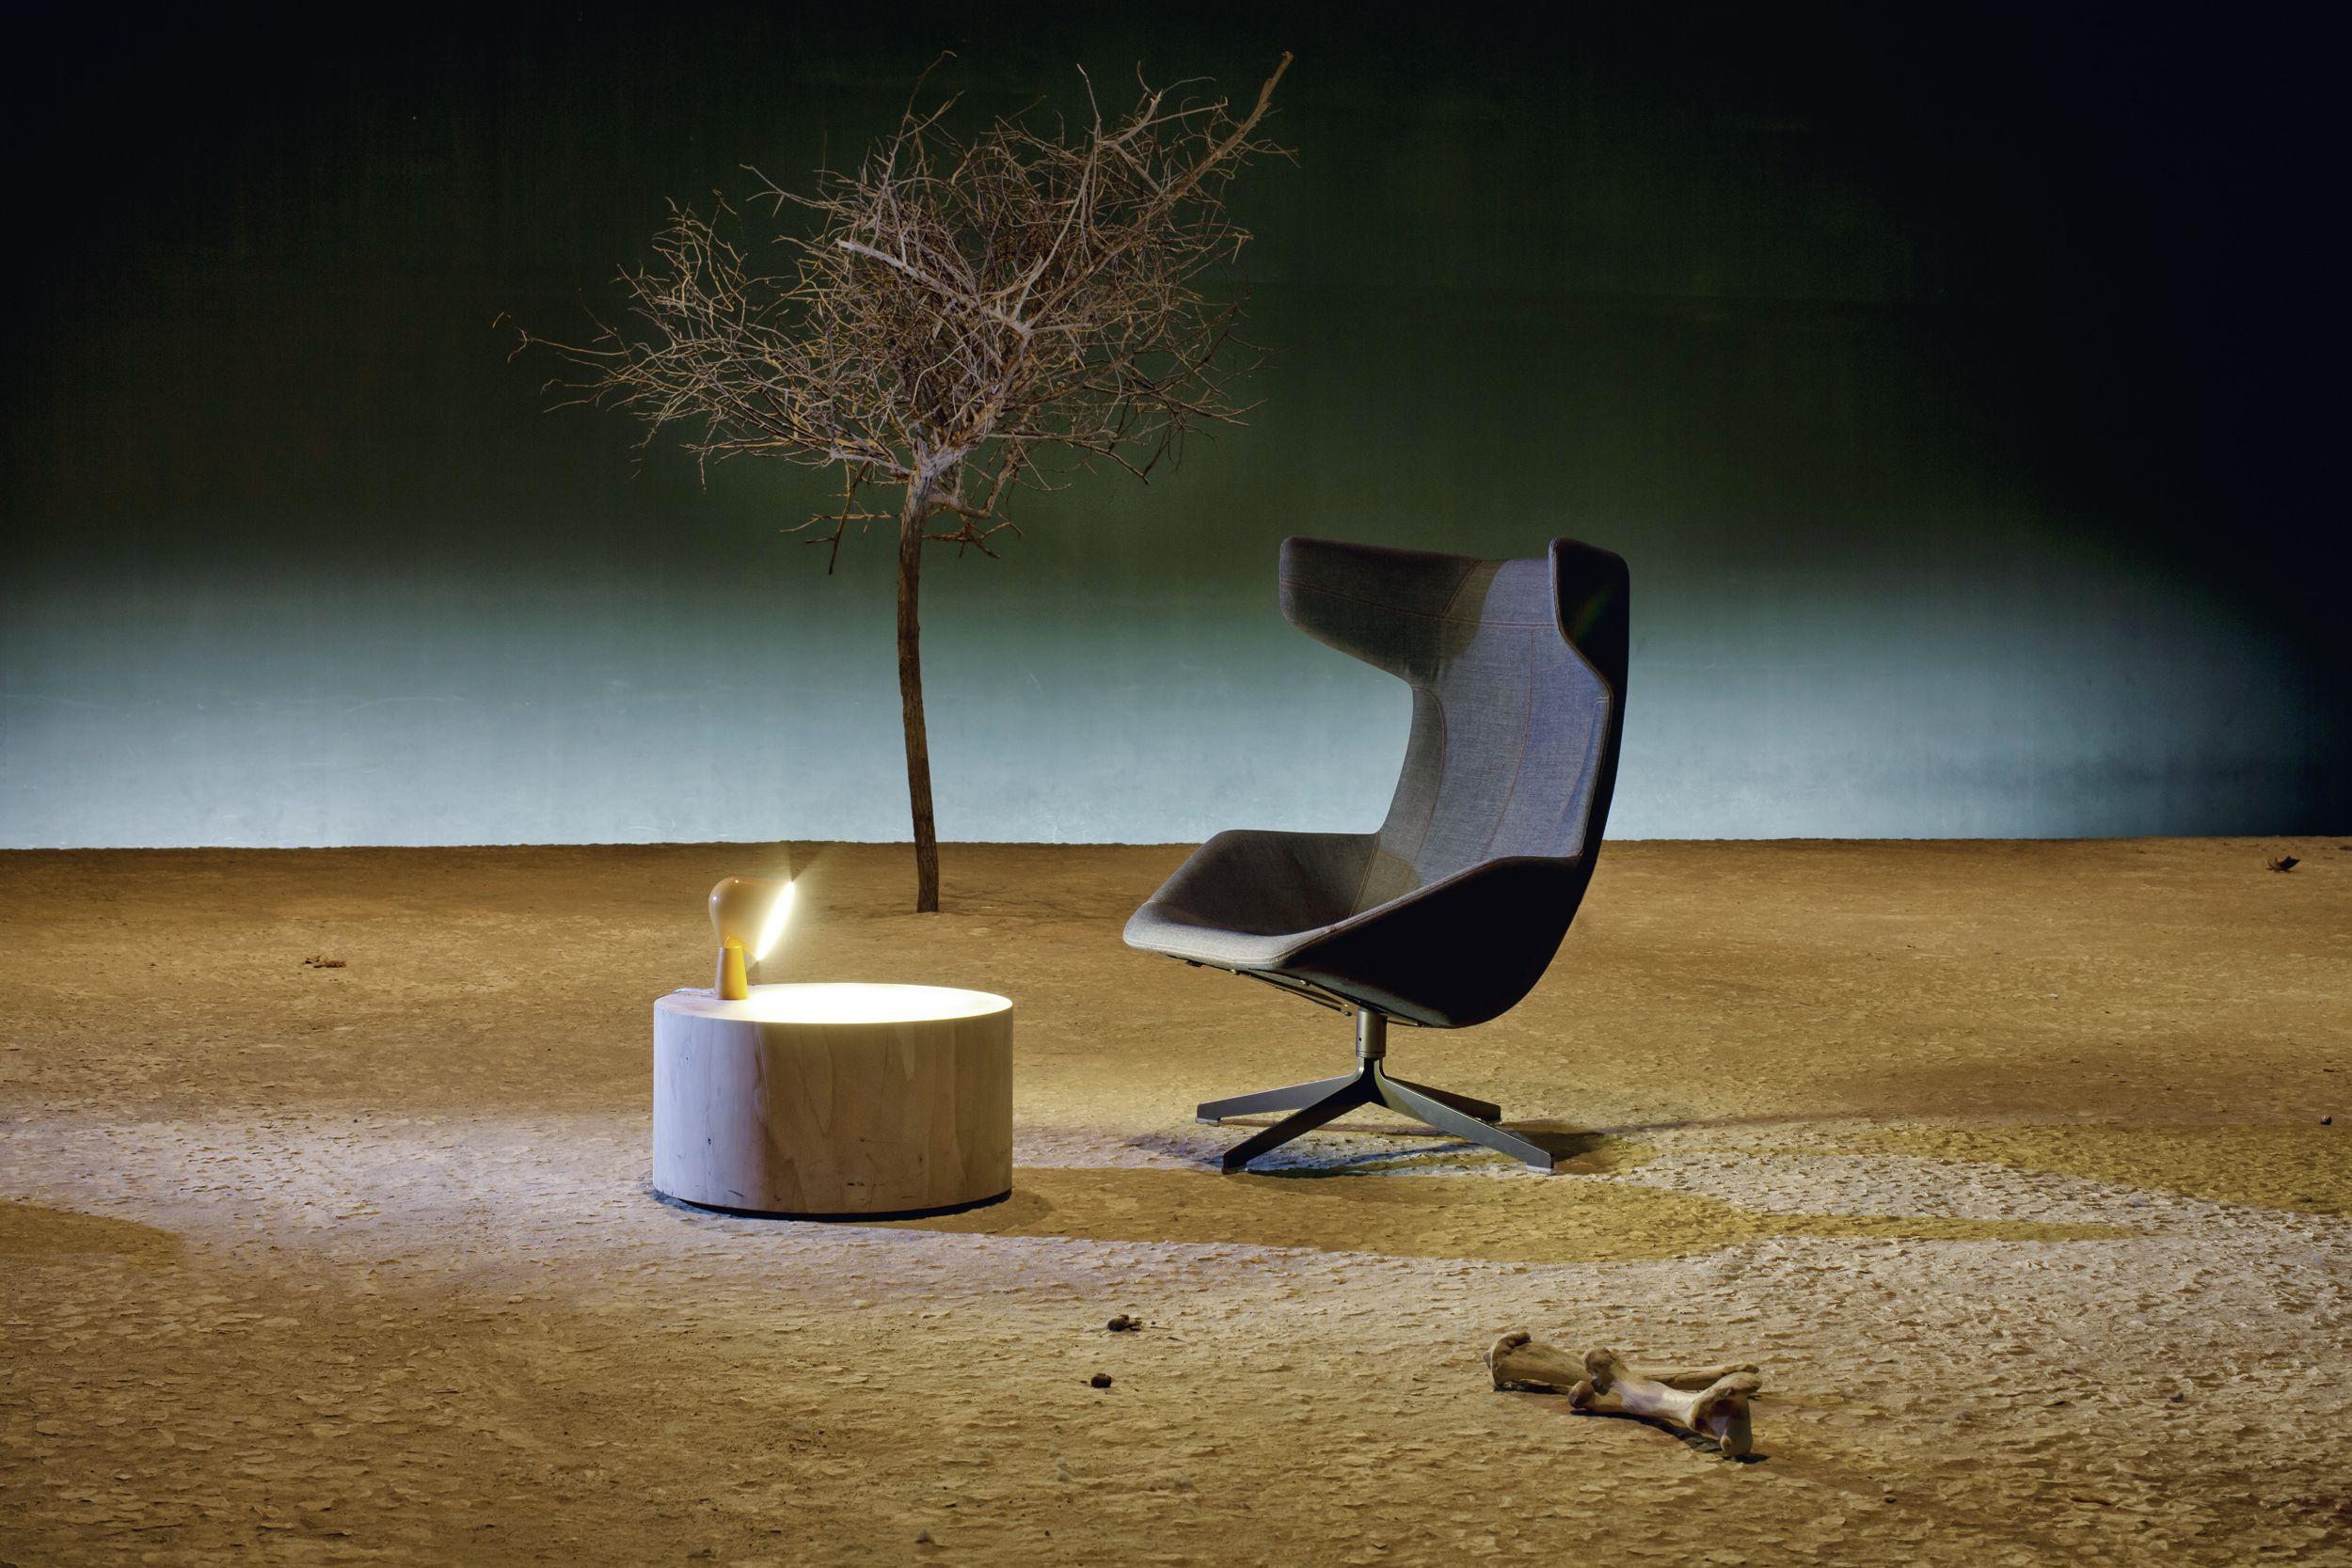 "LEUCHTE ""Binic"" von Foscarini, Design: Ionna Vautrin. TISCH ""Legno VIvo"" von Riva 1920, Design: Davide und Maurizio Riva. SESSEL "" Take a Line for a Walk"" von Moroso, Design: Alfredo Häberli."